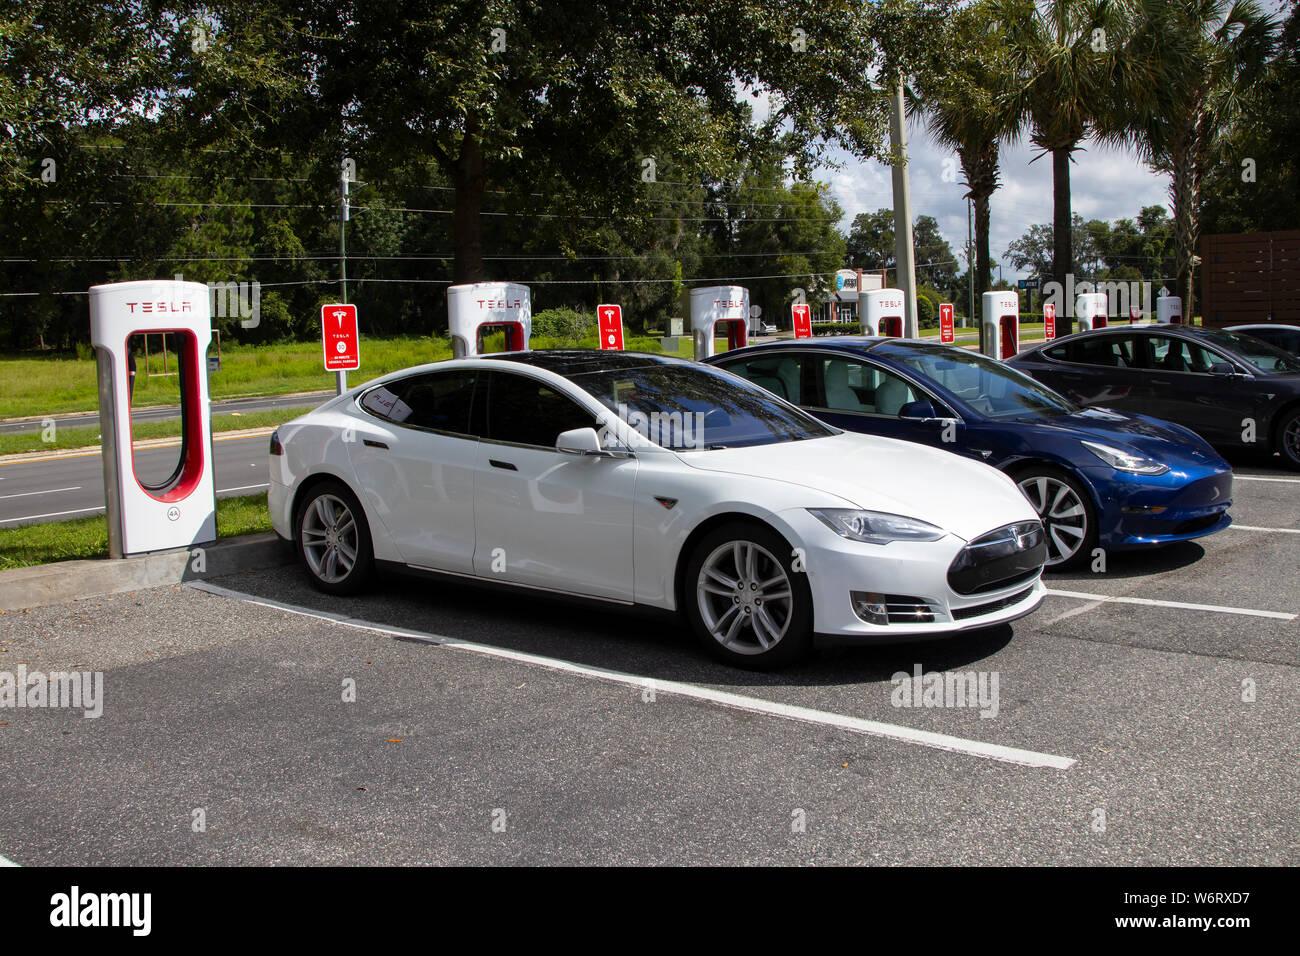 Tesla Model 3 Stock Photos & Tesla Model 3 Stock Images - Alamy